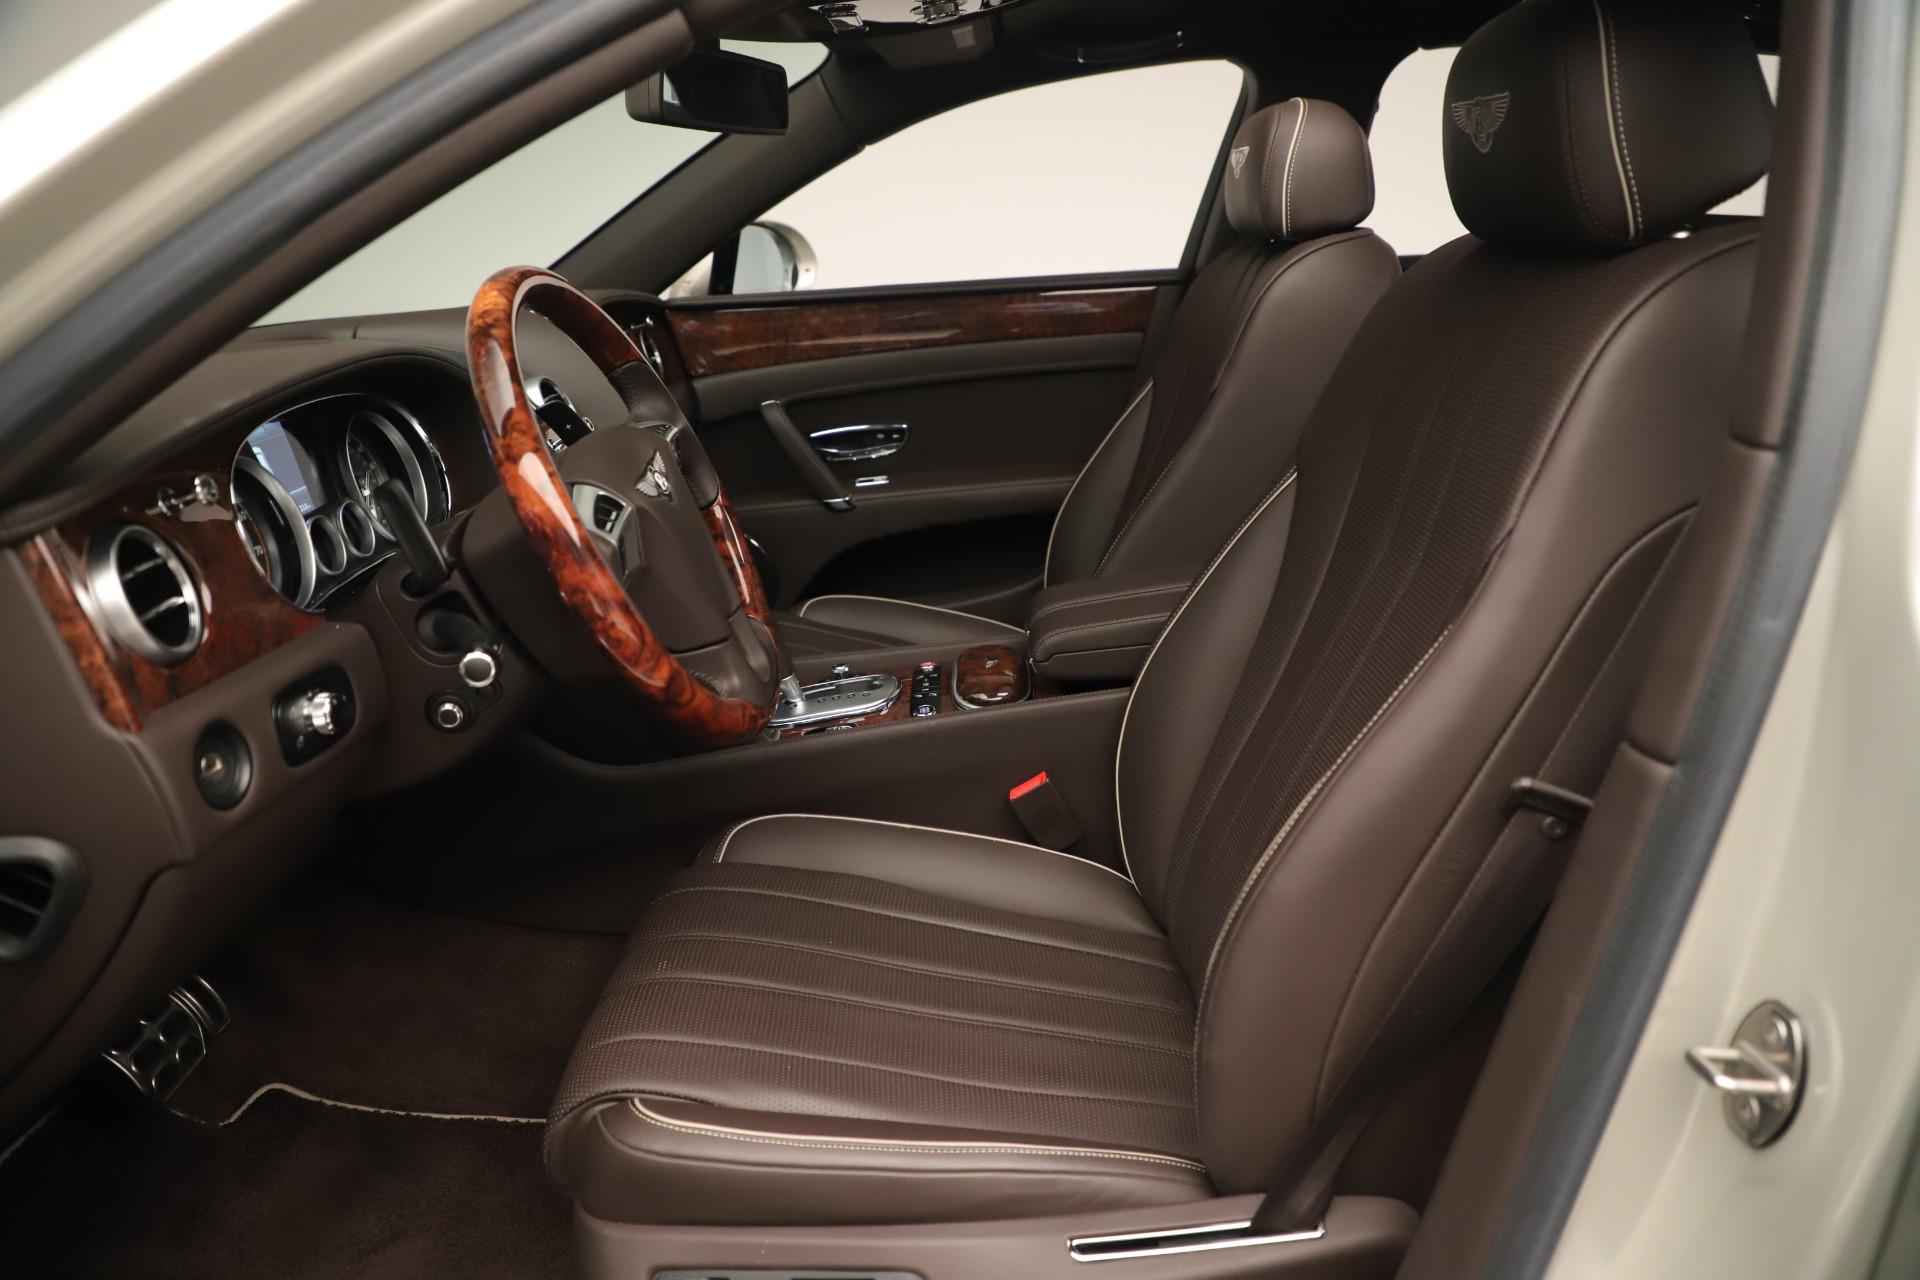 Used 2015 Bentley Flying Spur V8 For Sale In Westport, CT 3444_p17